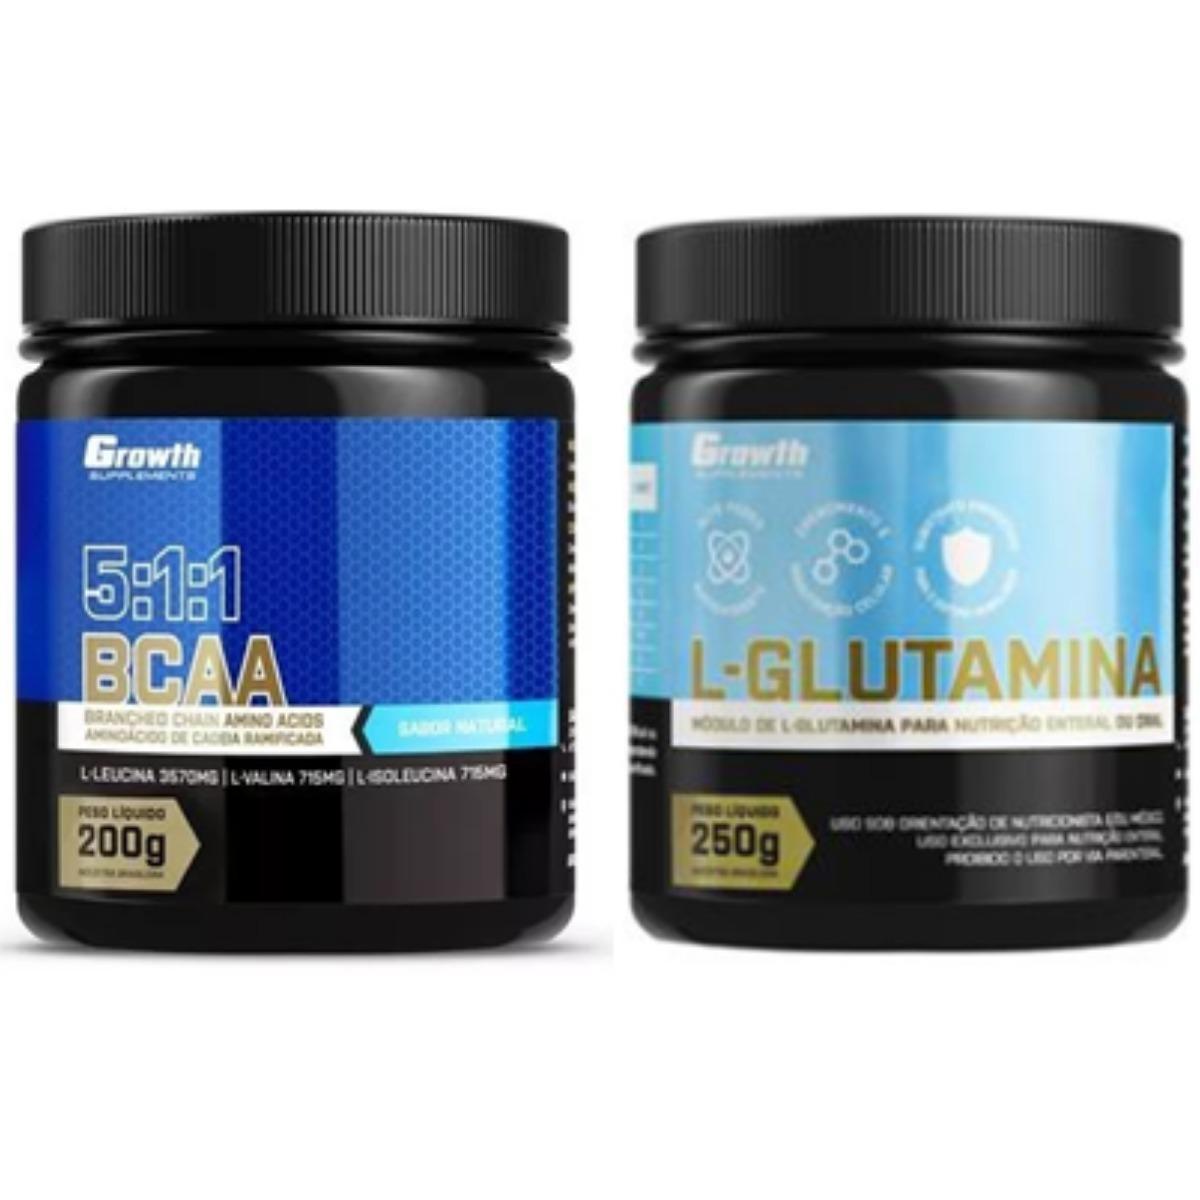 b977152a6 Kit Bcaa 5 1 1 + Glutamina - Growth - R  175